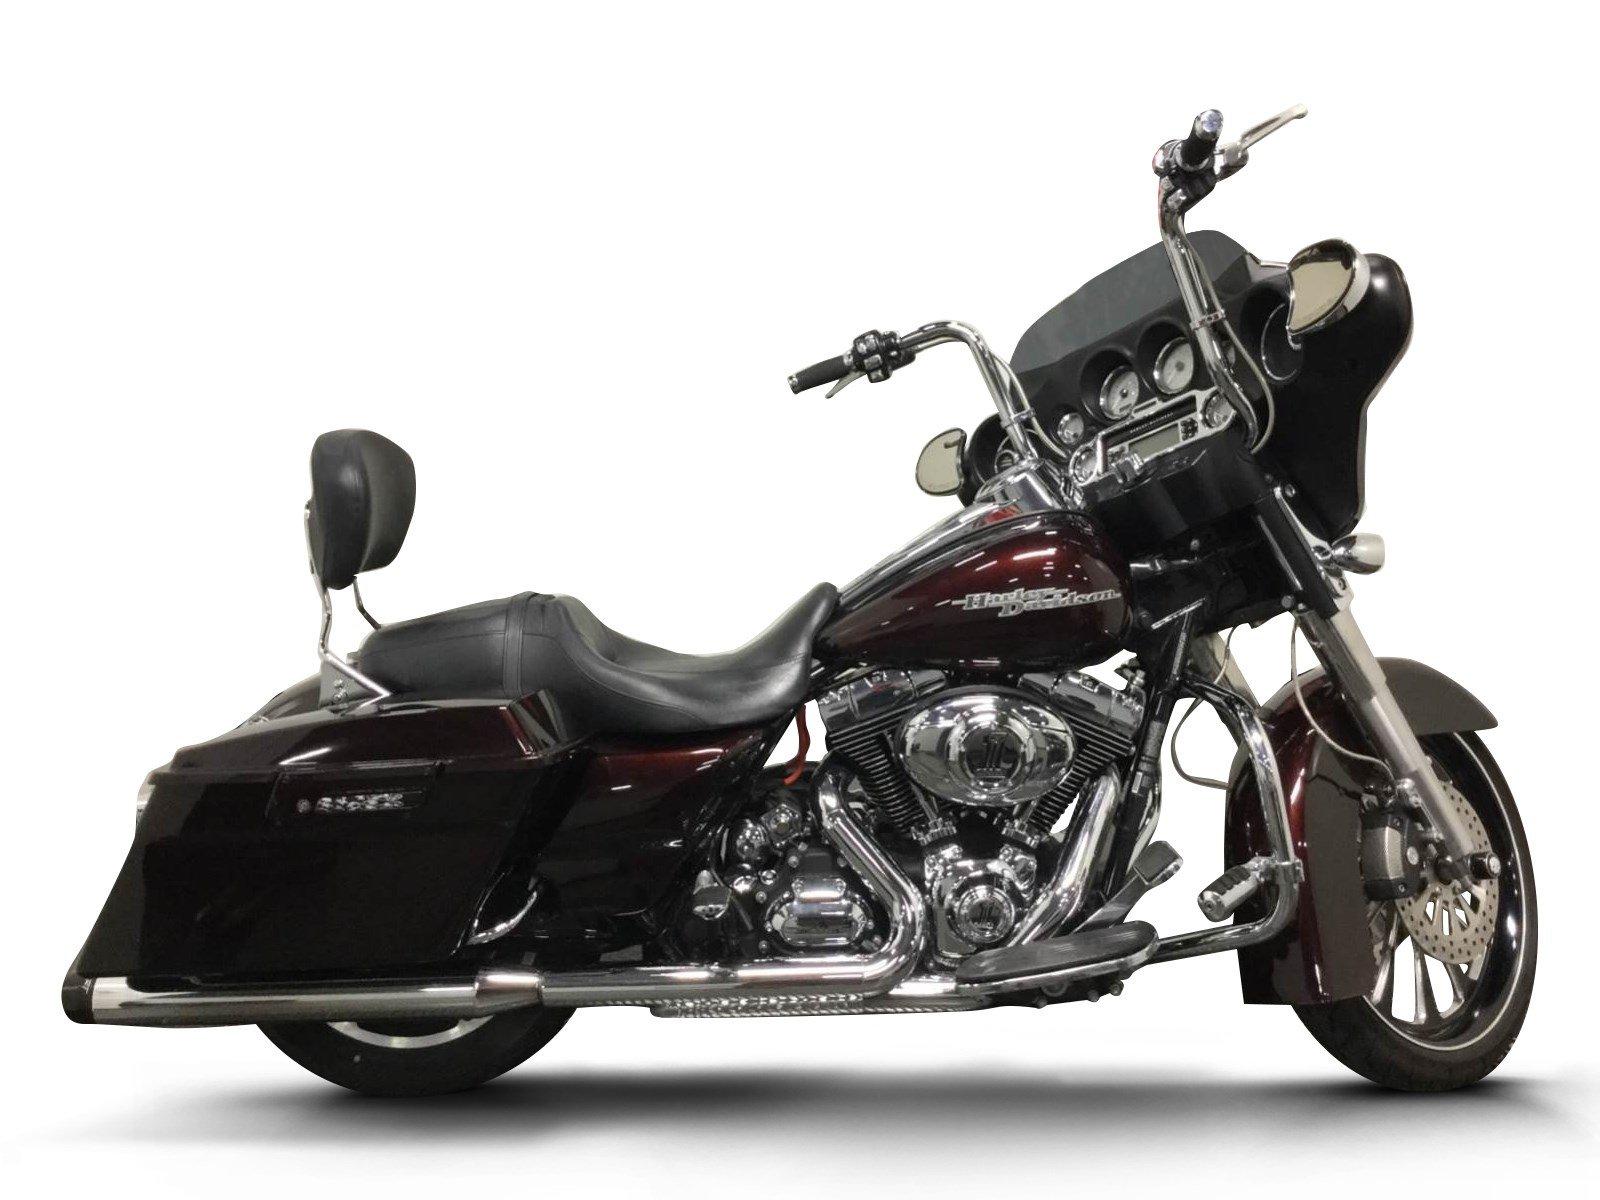 Street Glide For Sale >> 2011 Harley Davidson Flhx Street Glide